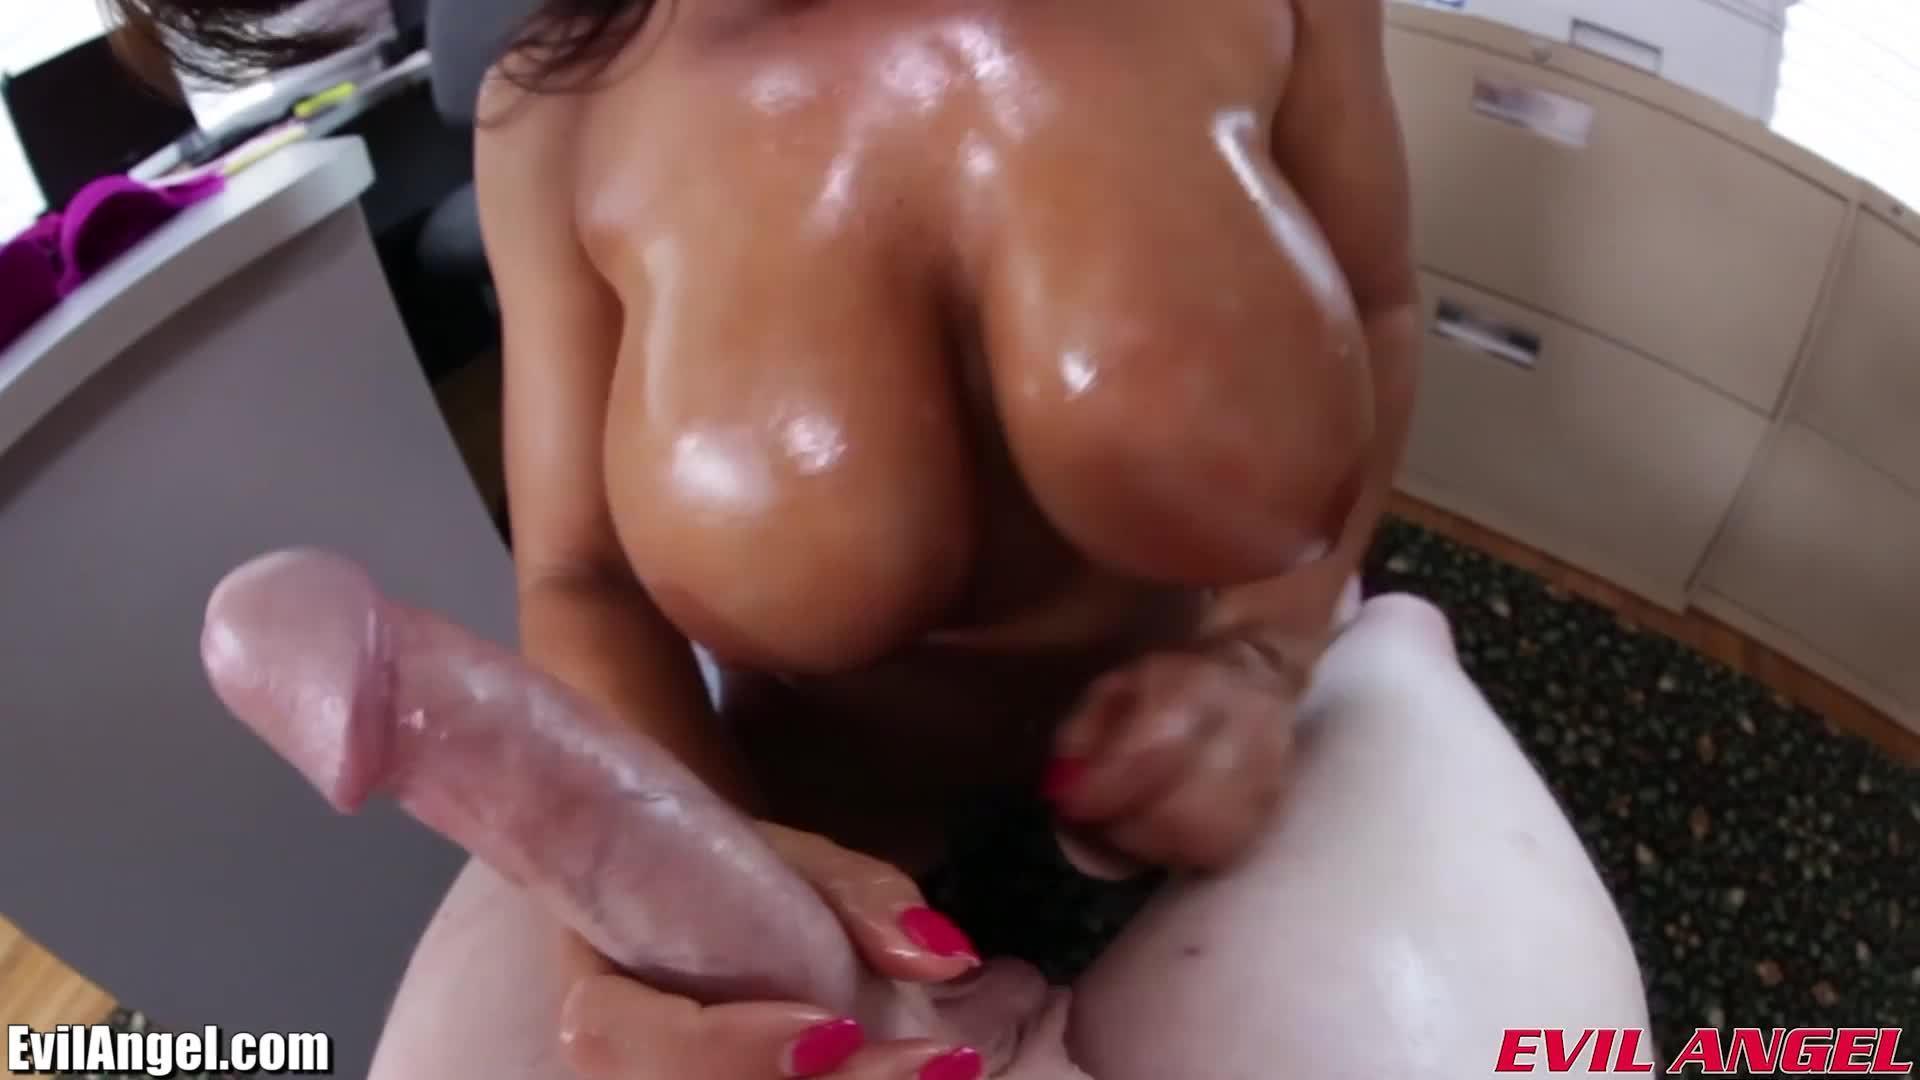 Ann POV Tit Fucking and Blowjob